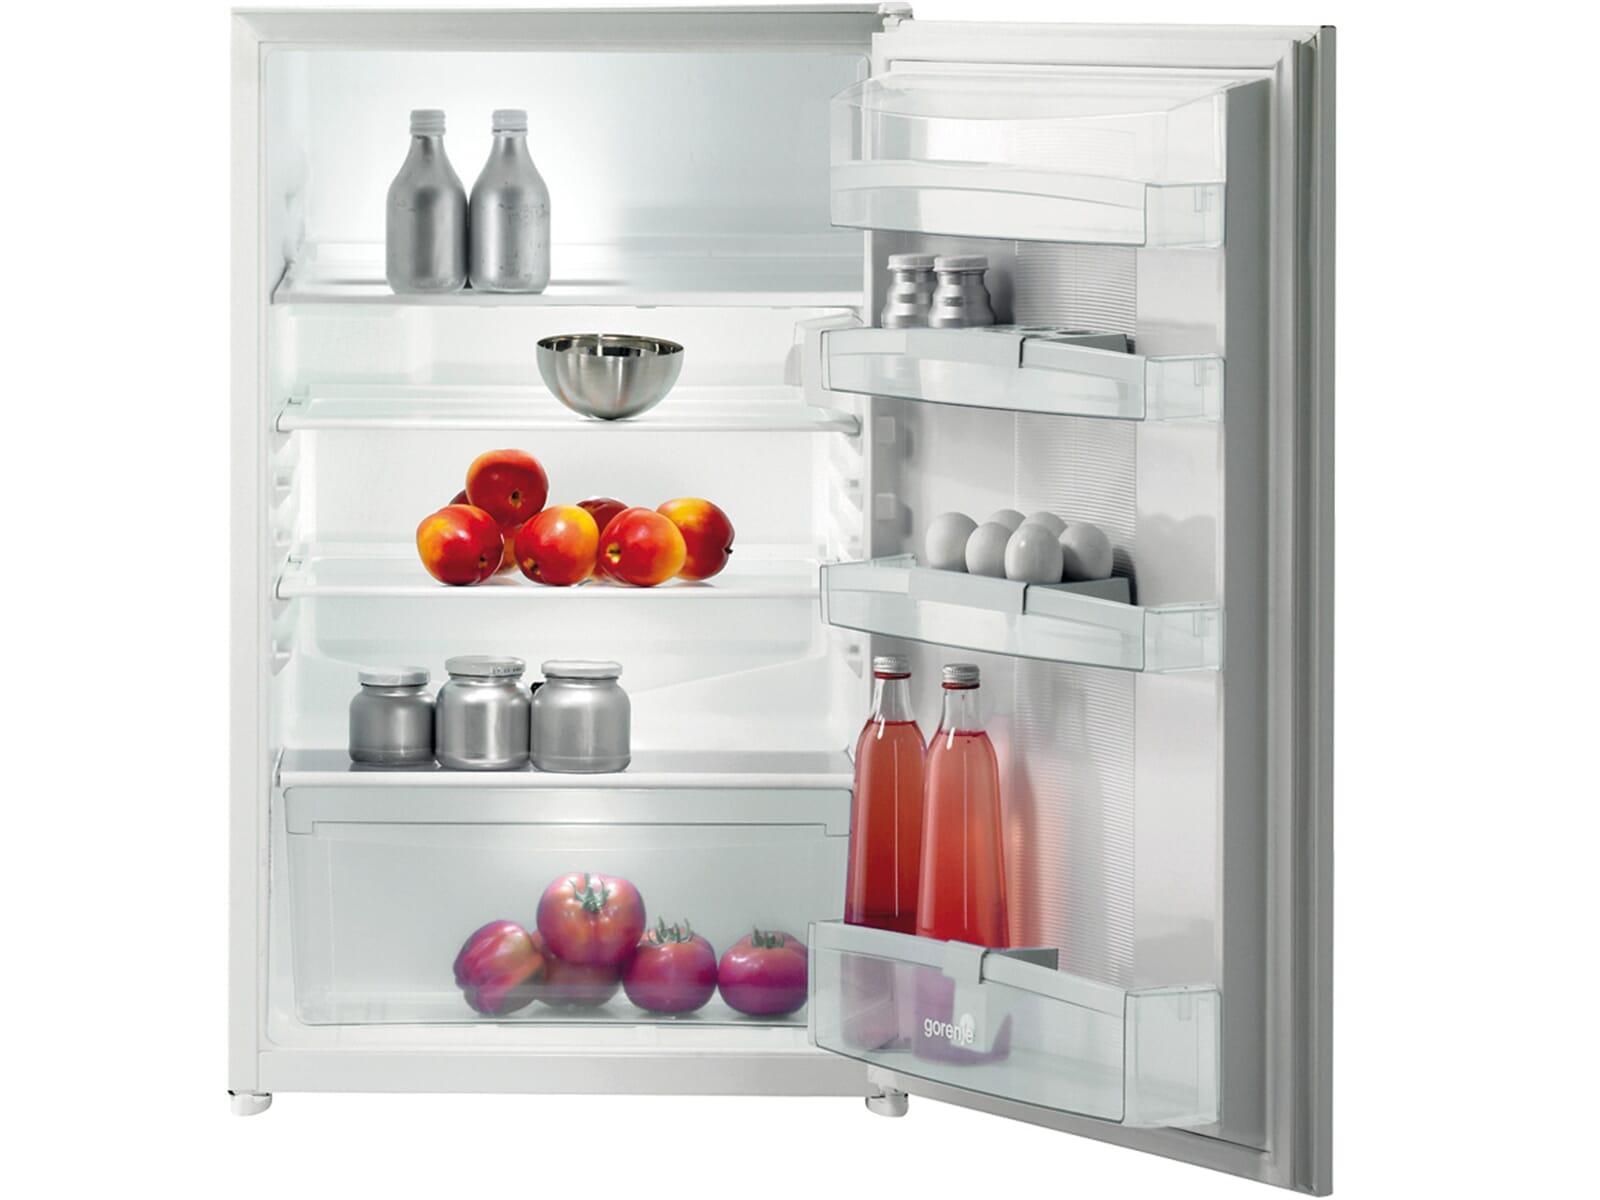 Bomann Kb 167 Kühlbox 50l Mini Kühlschrank A : Side by side kühlschrank integrierbar gorenje ri aw